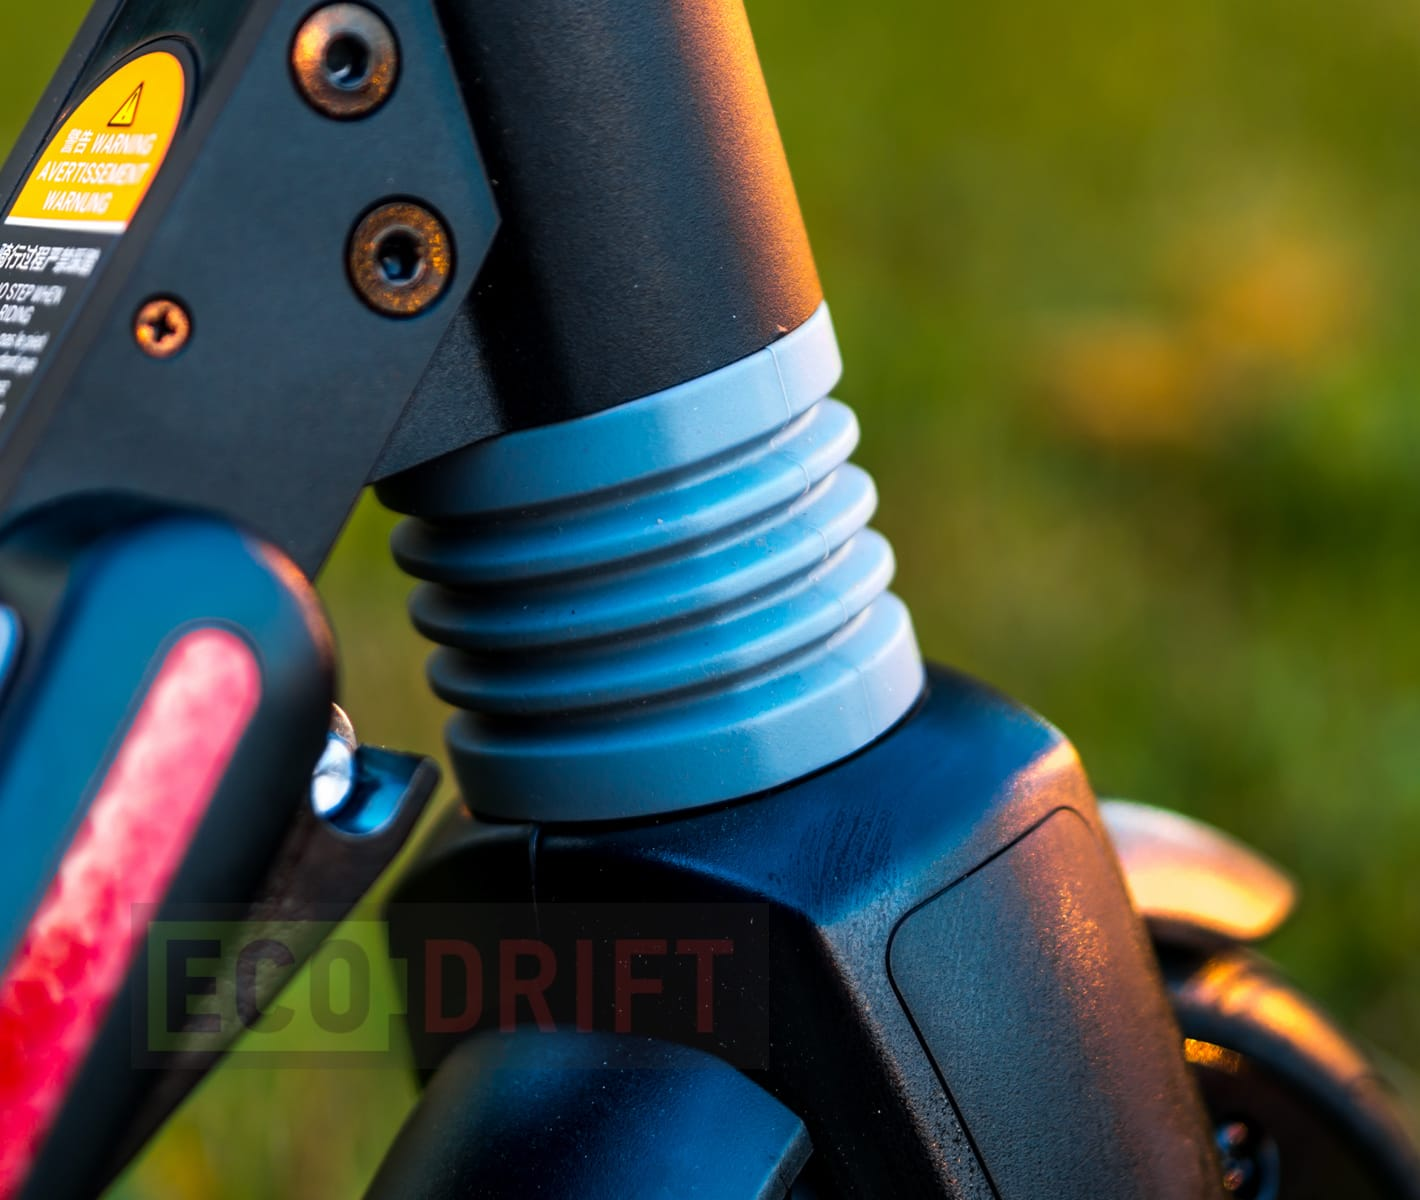 Обзор электросамоката Ninebot by Segway Kickscooter ES1. Внешний вид